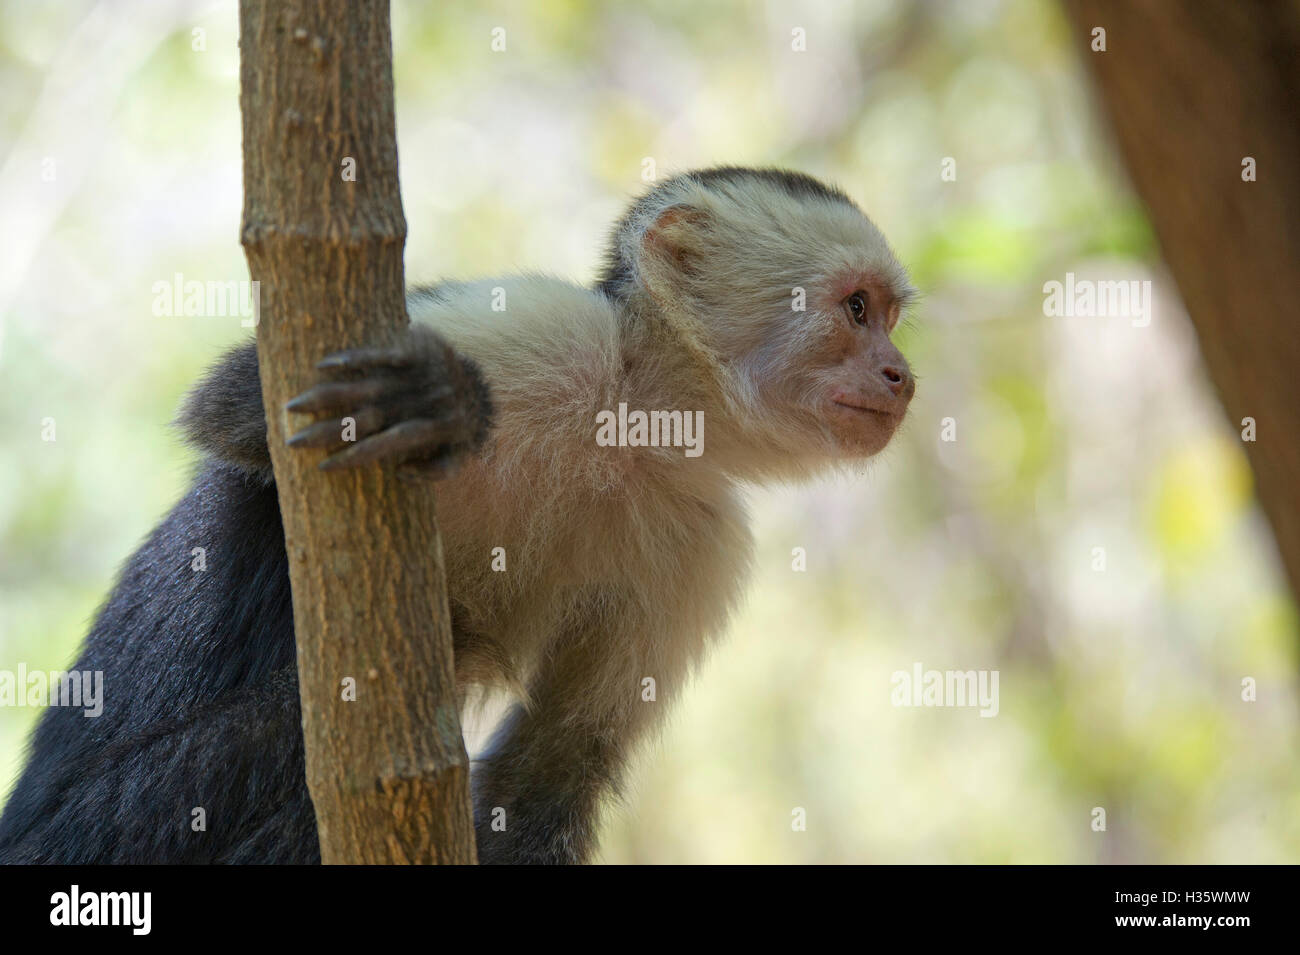 White-headed capuchin (Cebus capucinus) monkey in the jungle of Costa Rica Stock Photo